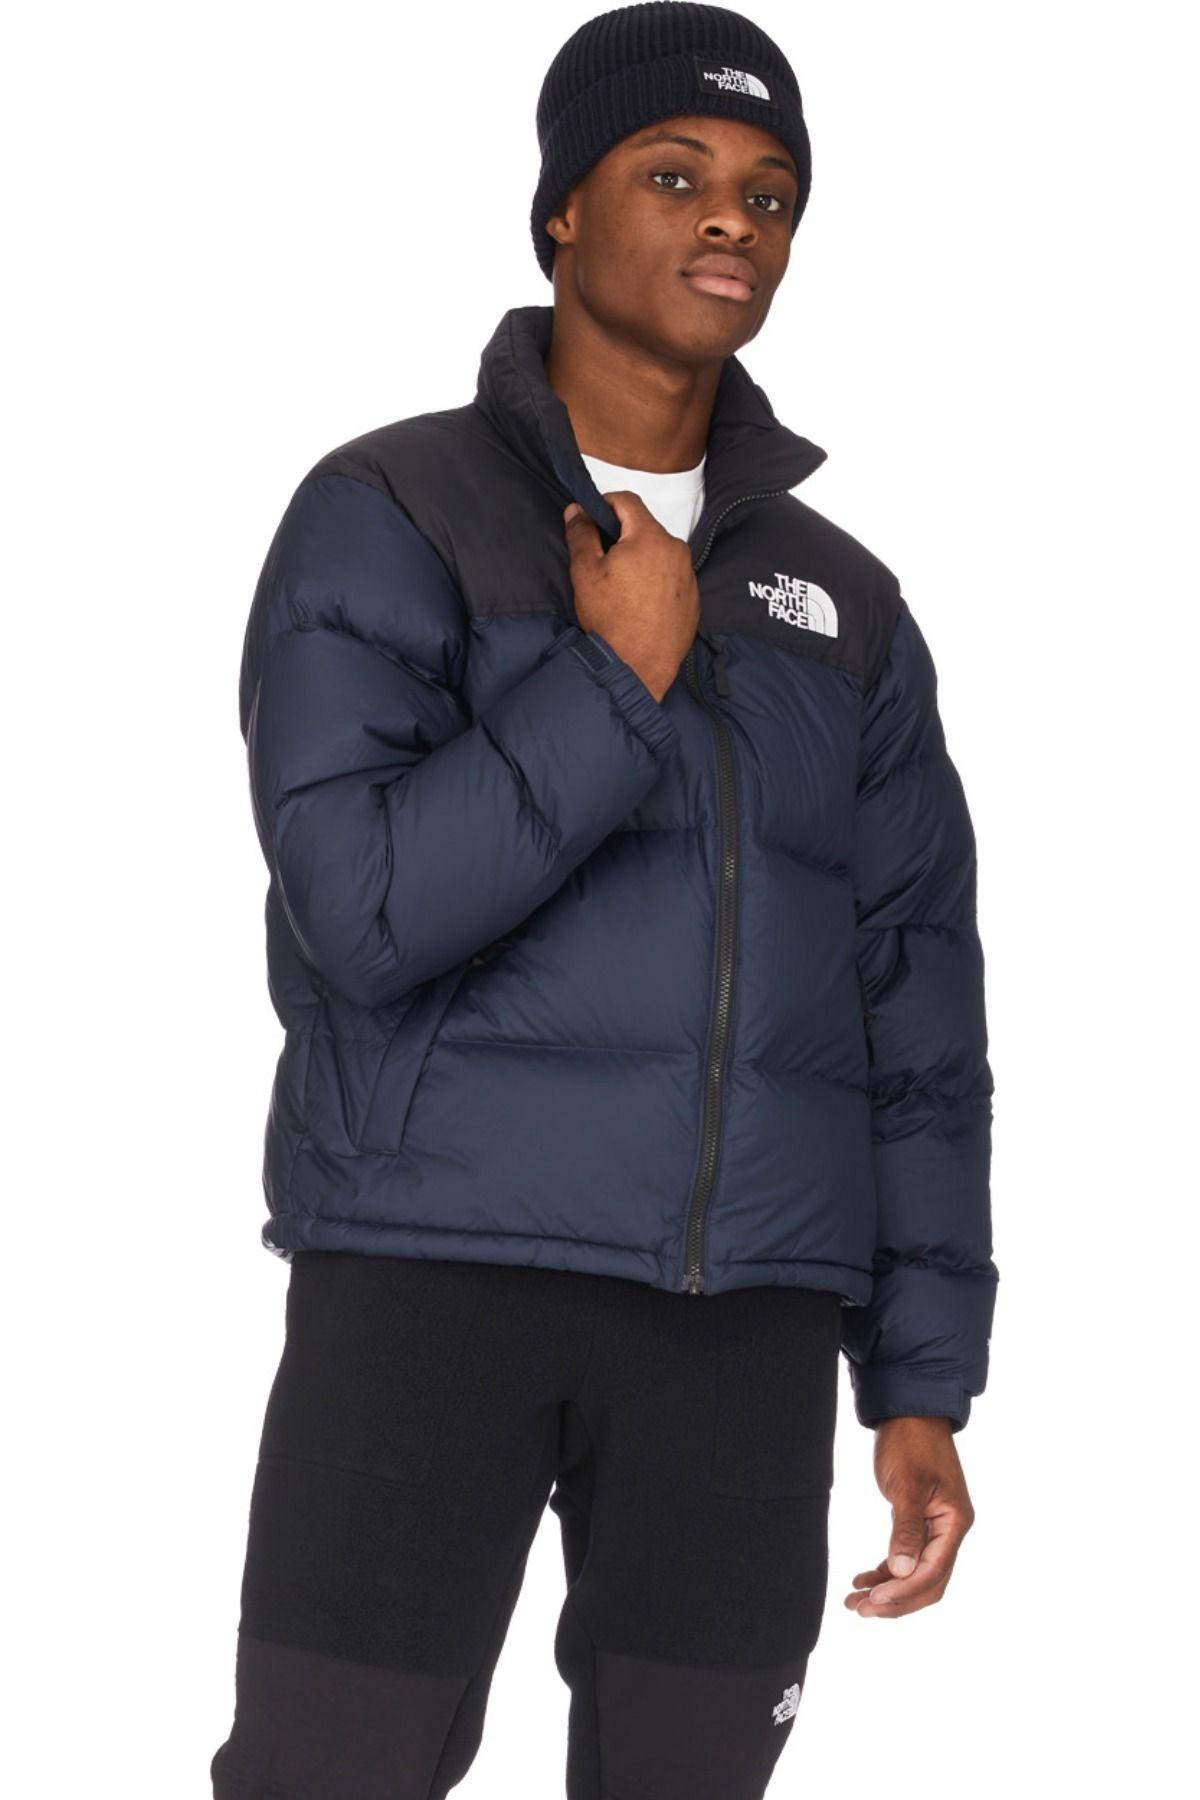 The North Face 1996 Retro Nuptse Jacket Urban Navy 1996 Retro Nuptse Jacket Retro Nuptse Jacket Jackets [ 1800 x 1200 Pixel ]